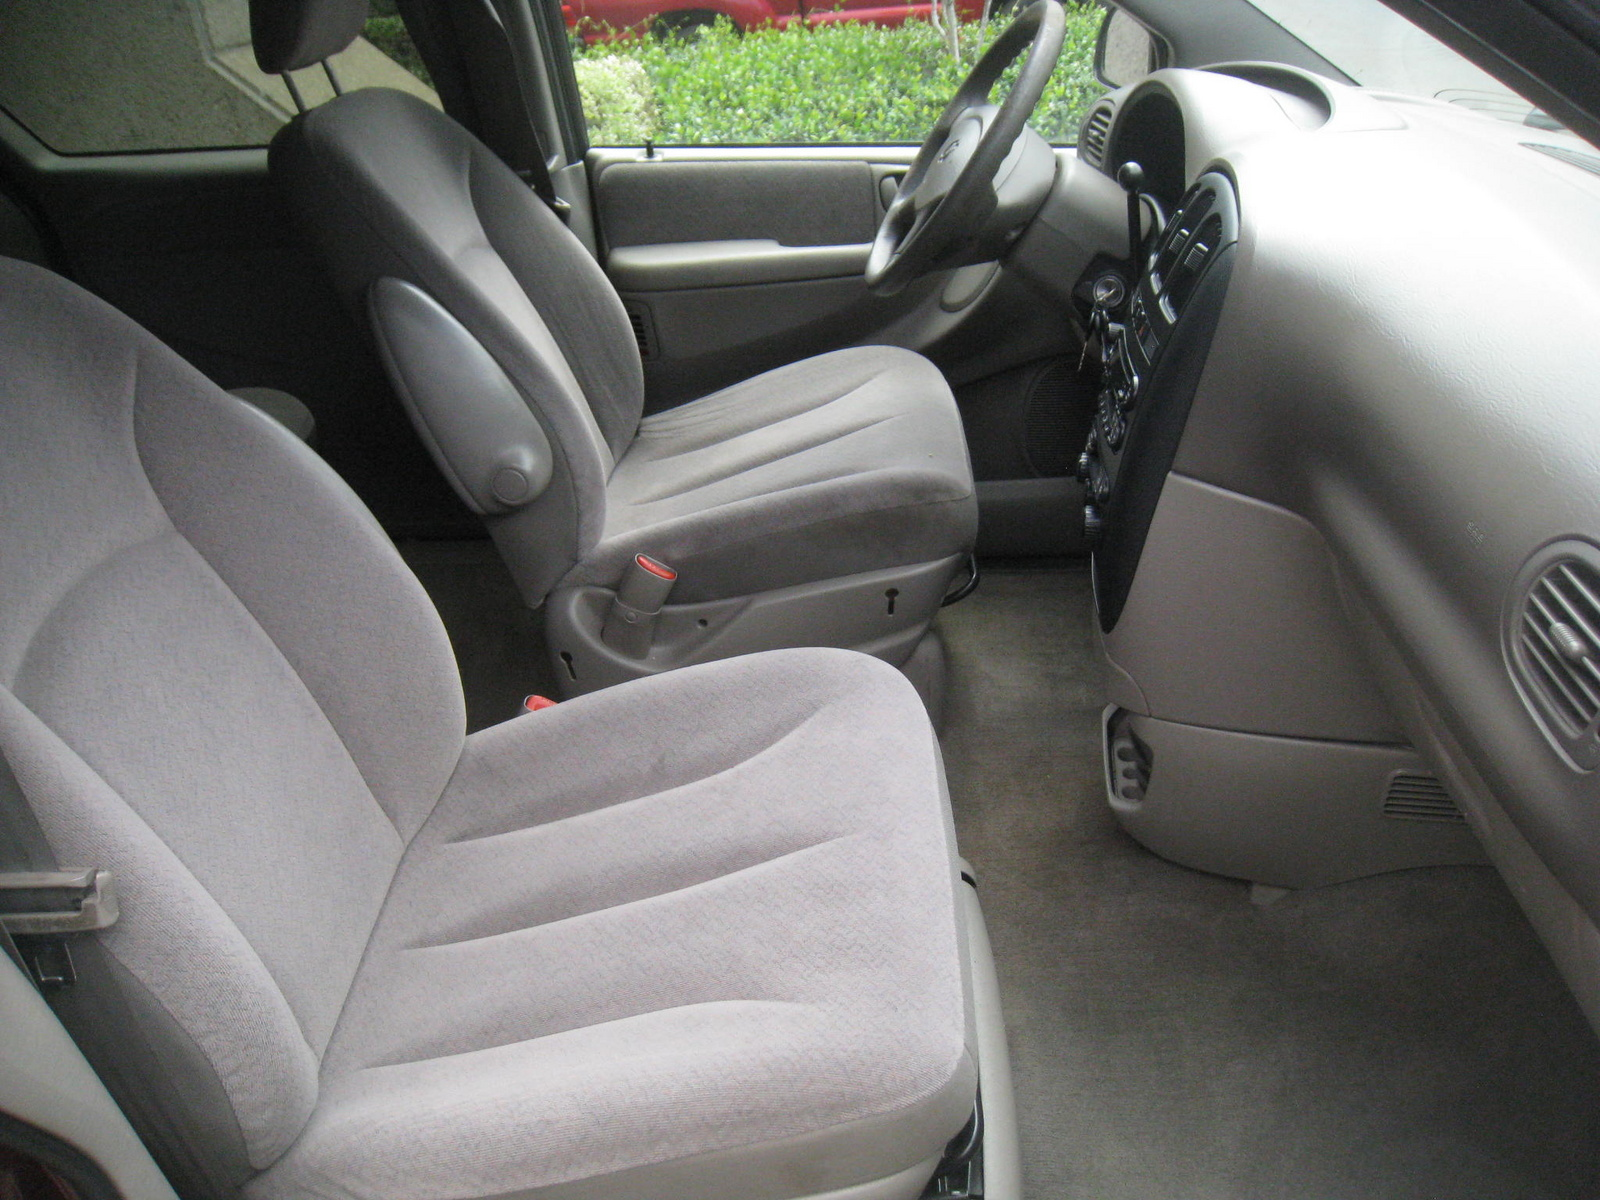 Dodge Grand Caravan Pic on 2000 Dodge Caravan Interior